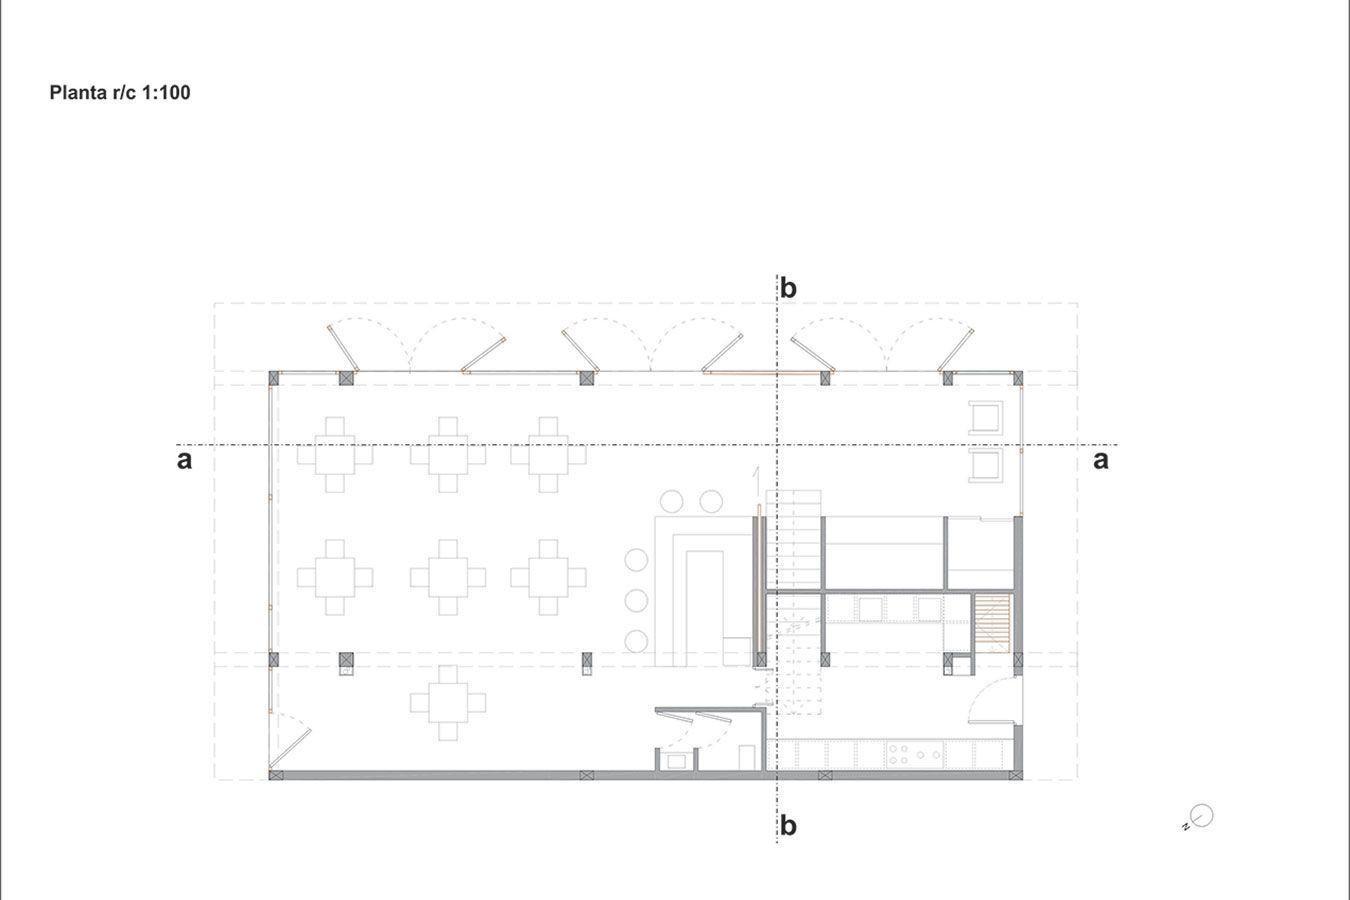 acquiles eco hotel_25_Ramos Castellano Architects_01_Floor plans.jpg